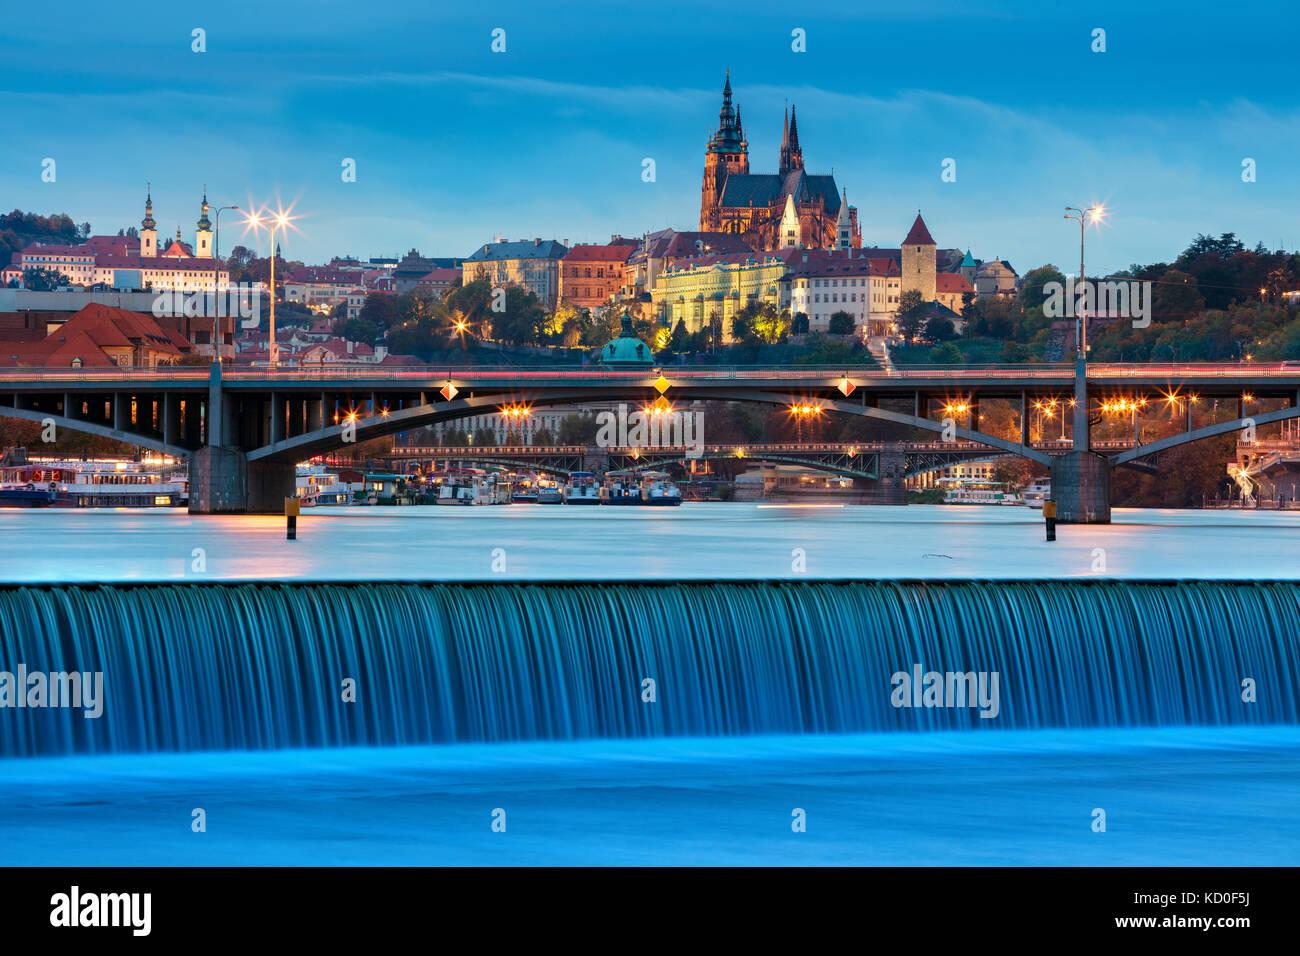 Prague. Image of Prague, capital city of Czech Republic, during twilight blue hour. - Stock Image